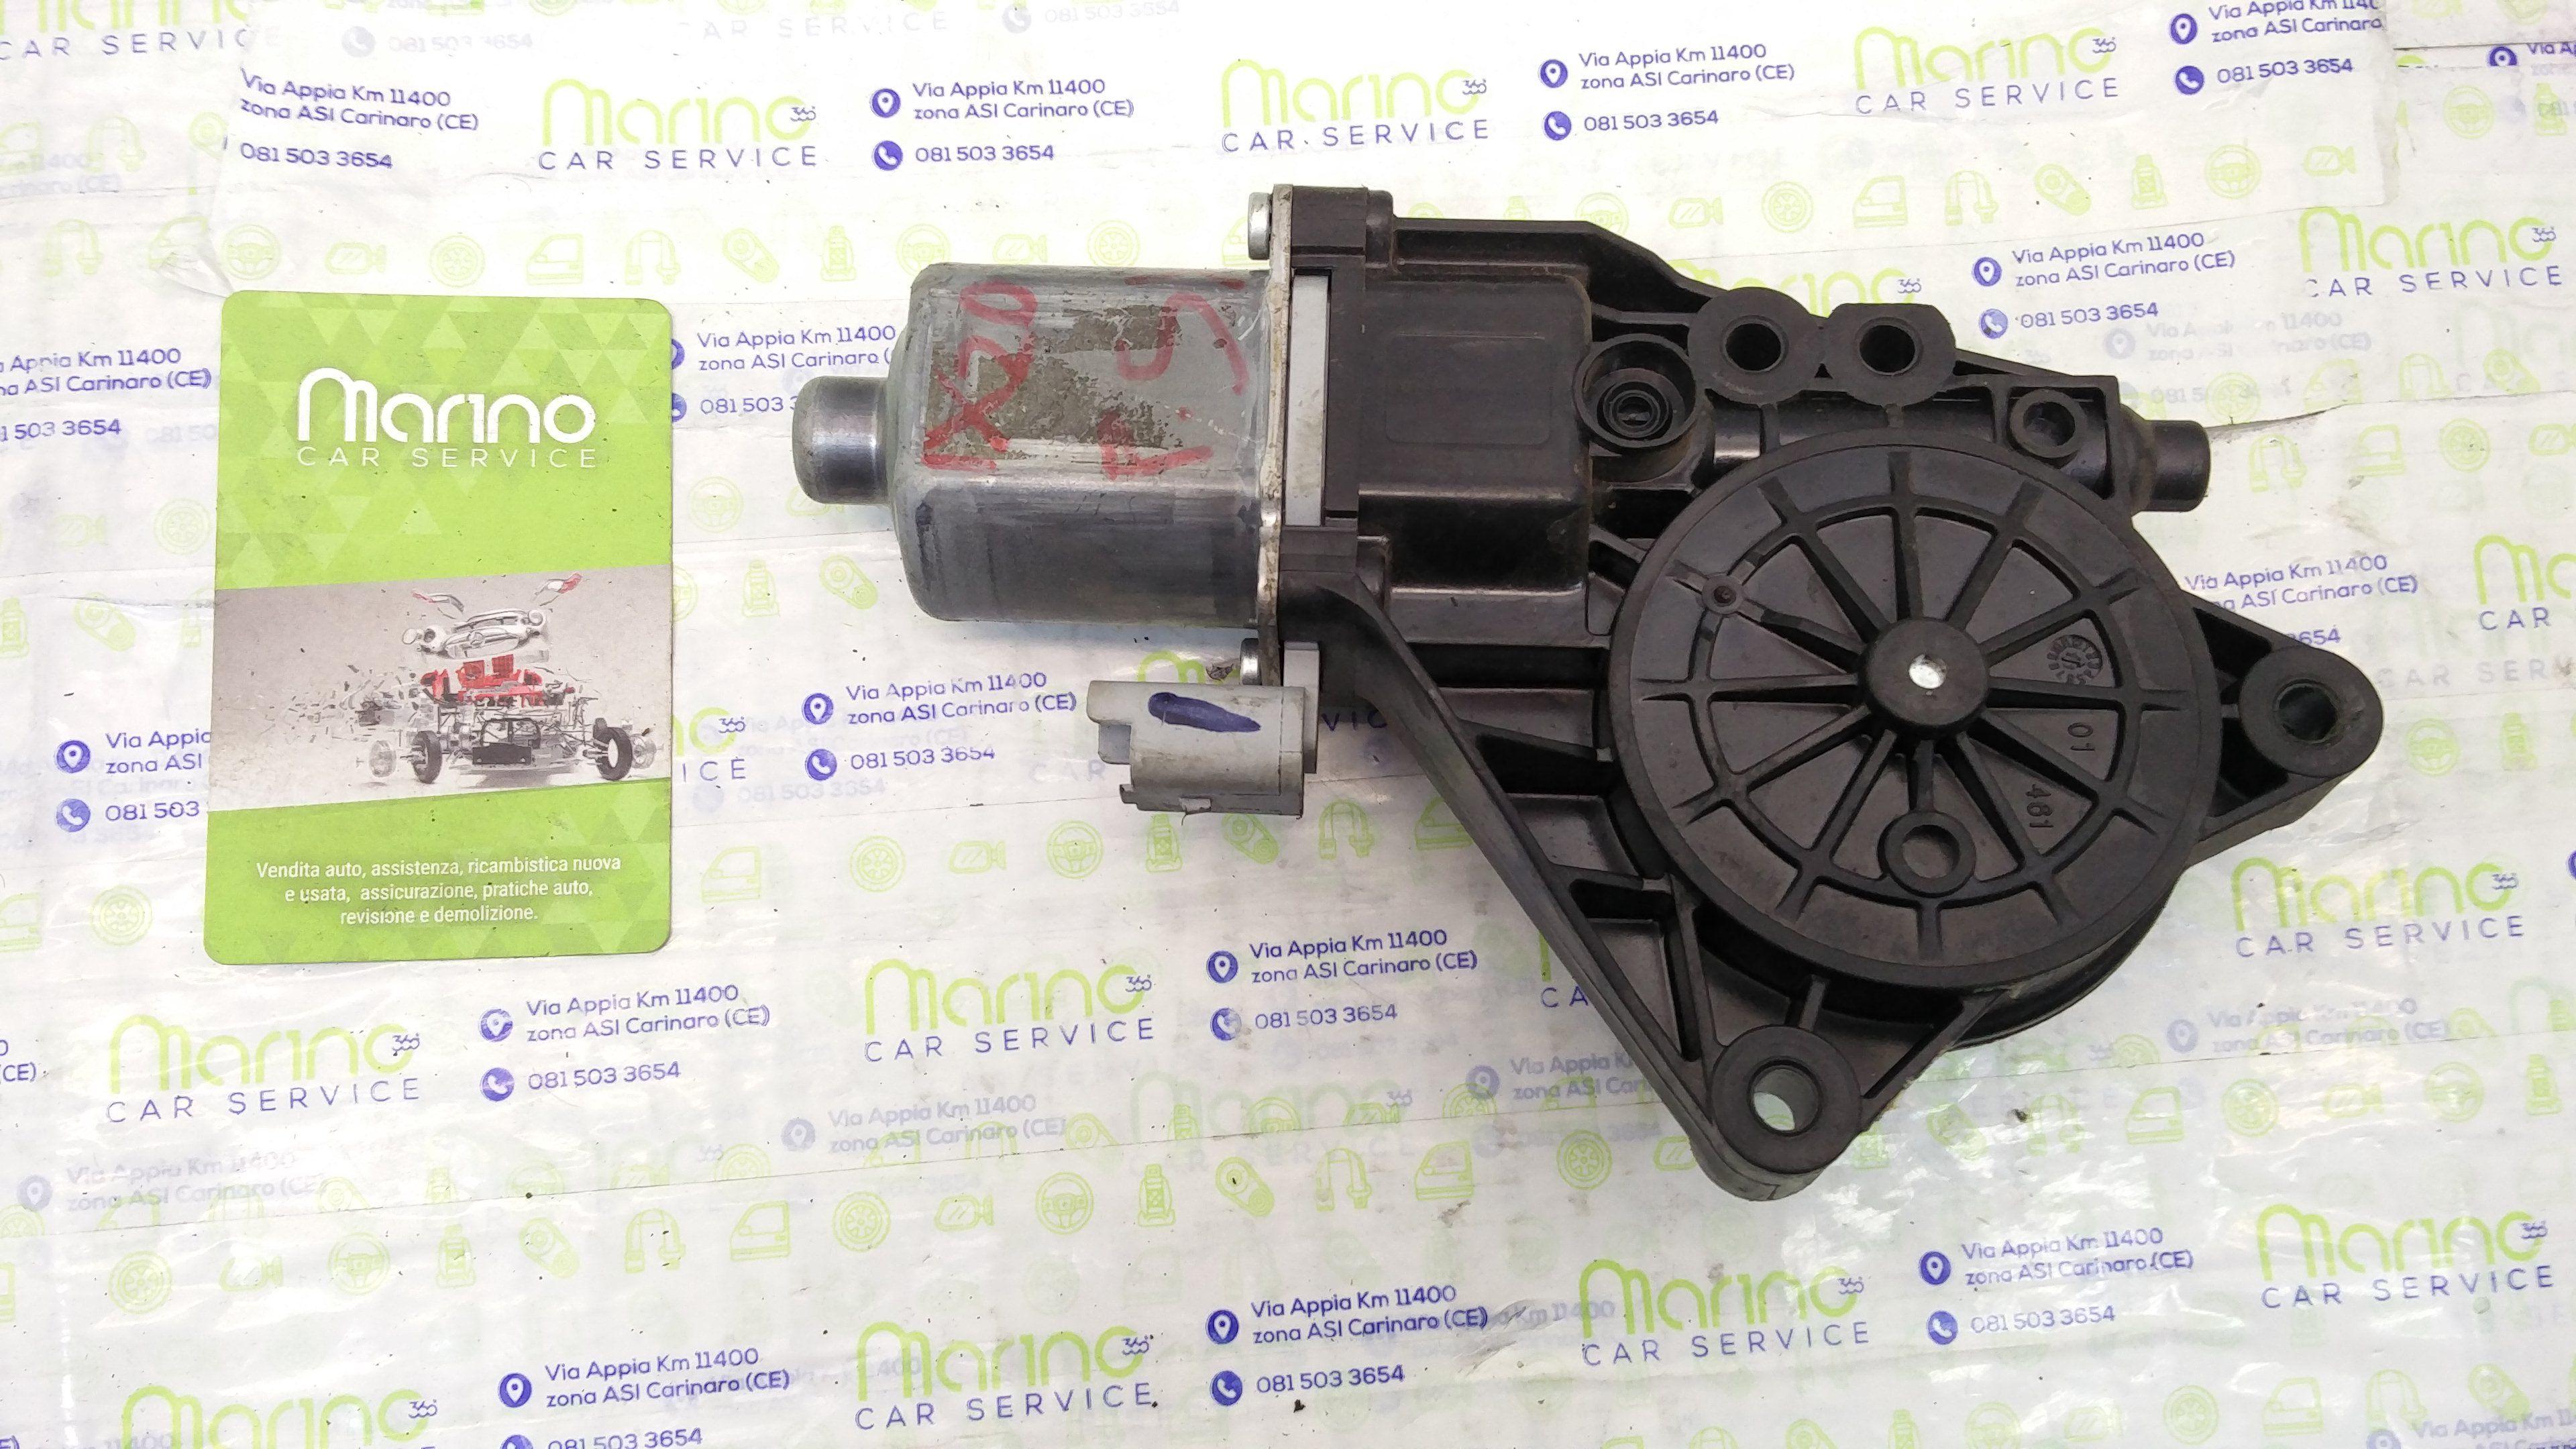 MOTORINO ALZAVETRO POSTERIORE SINISTRO HYUNDAI iX20 Serie (10>18) Benzina (2012) RICAMBI USATI